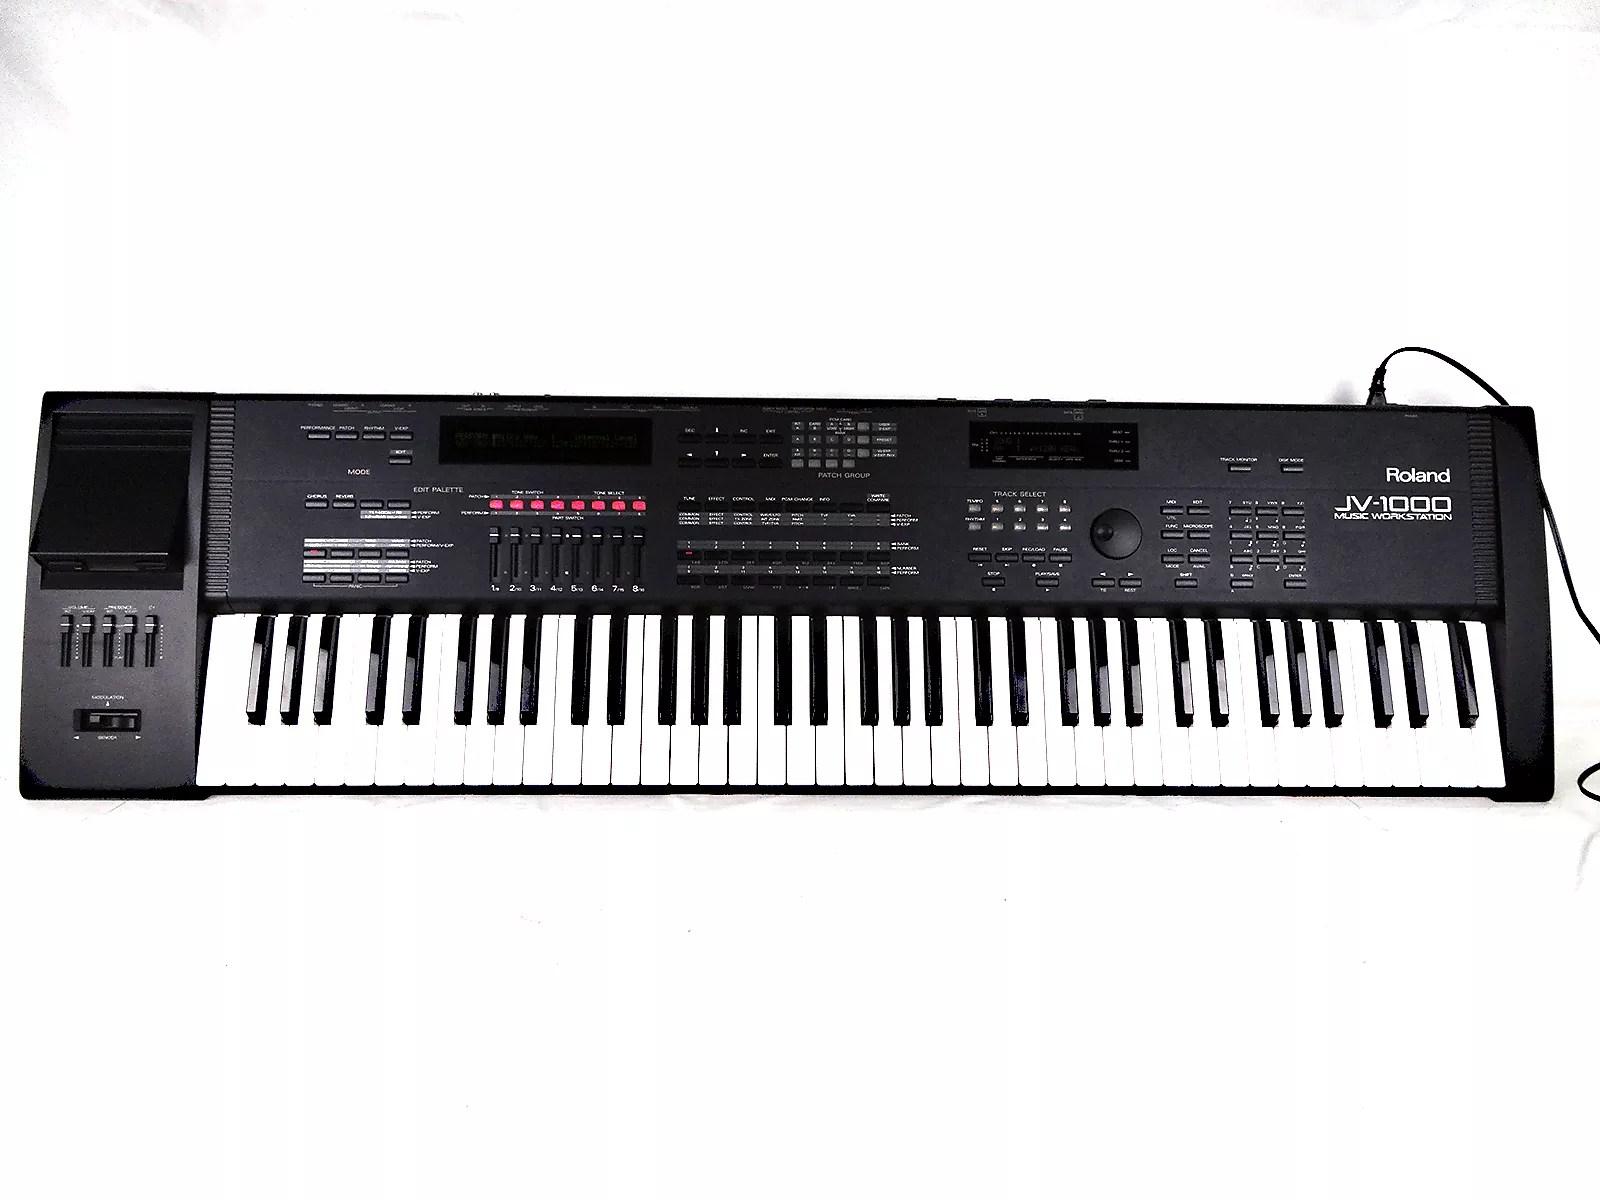 88 key piano keyboard diagram advance t8 ballast wiring roland jv 1000 76 music workstation reverb